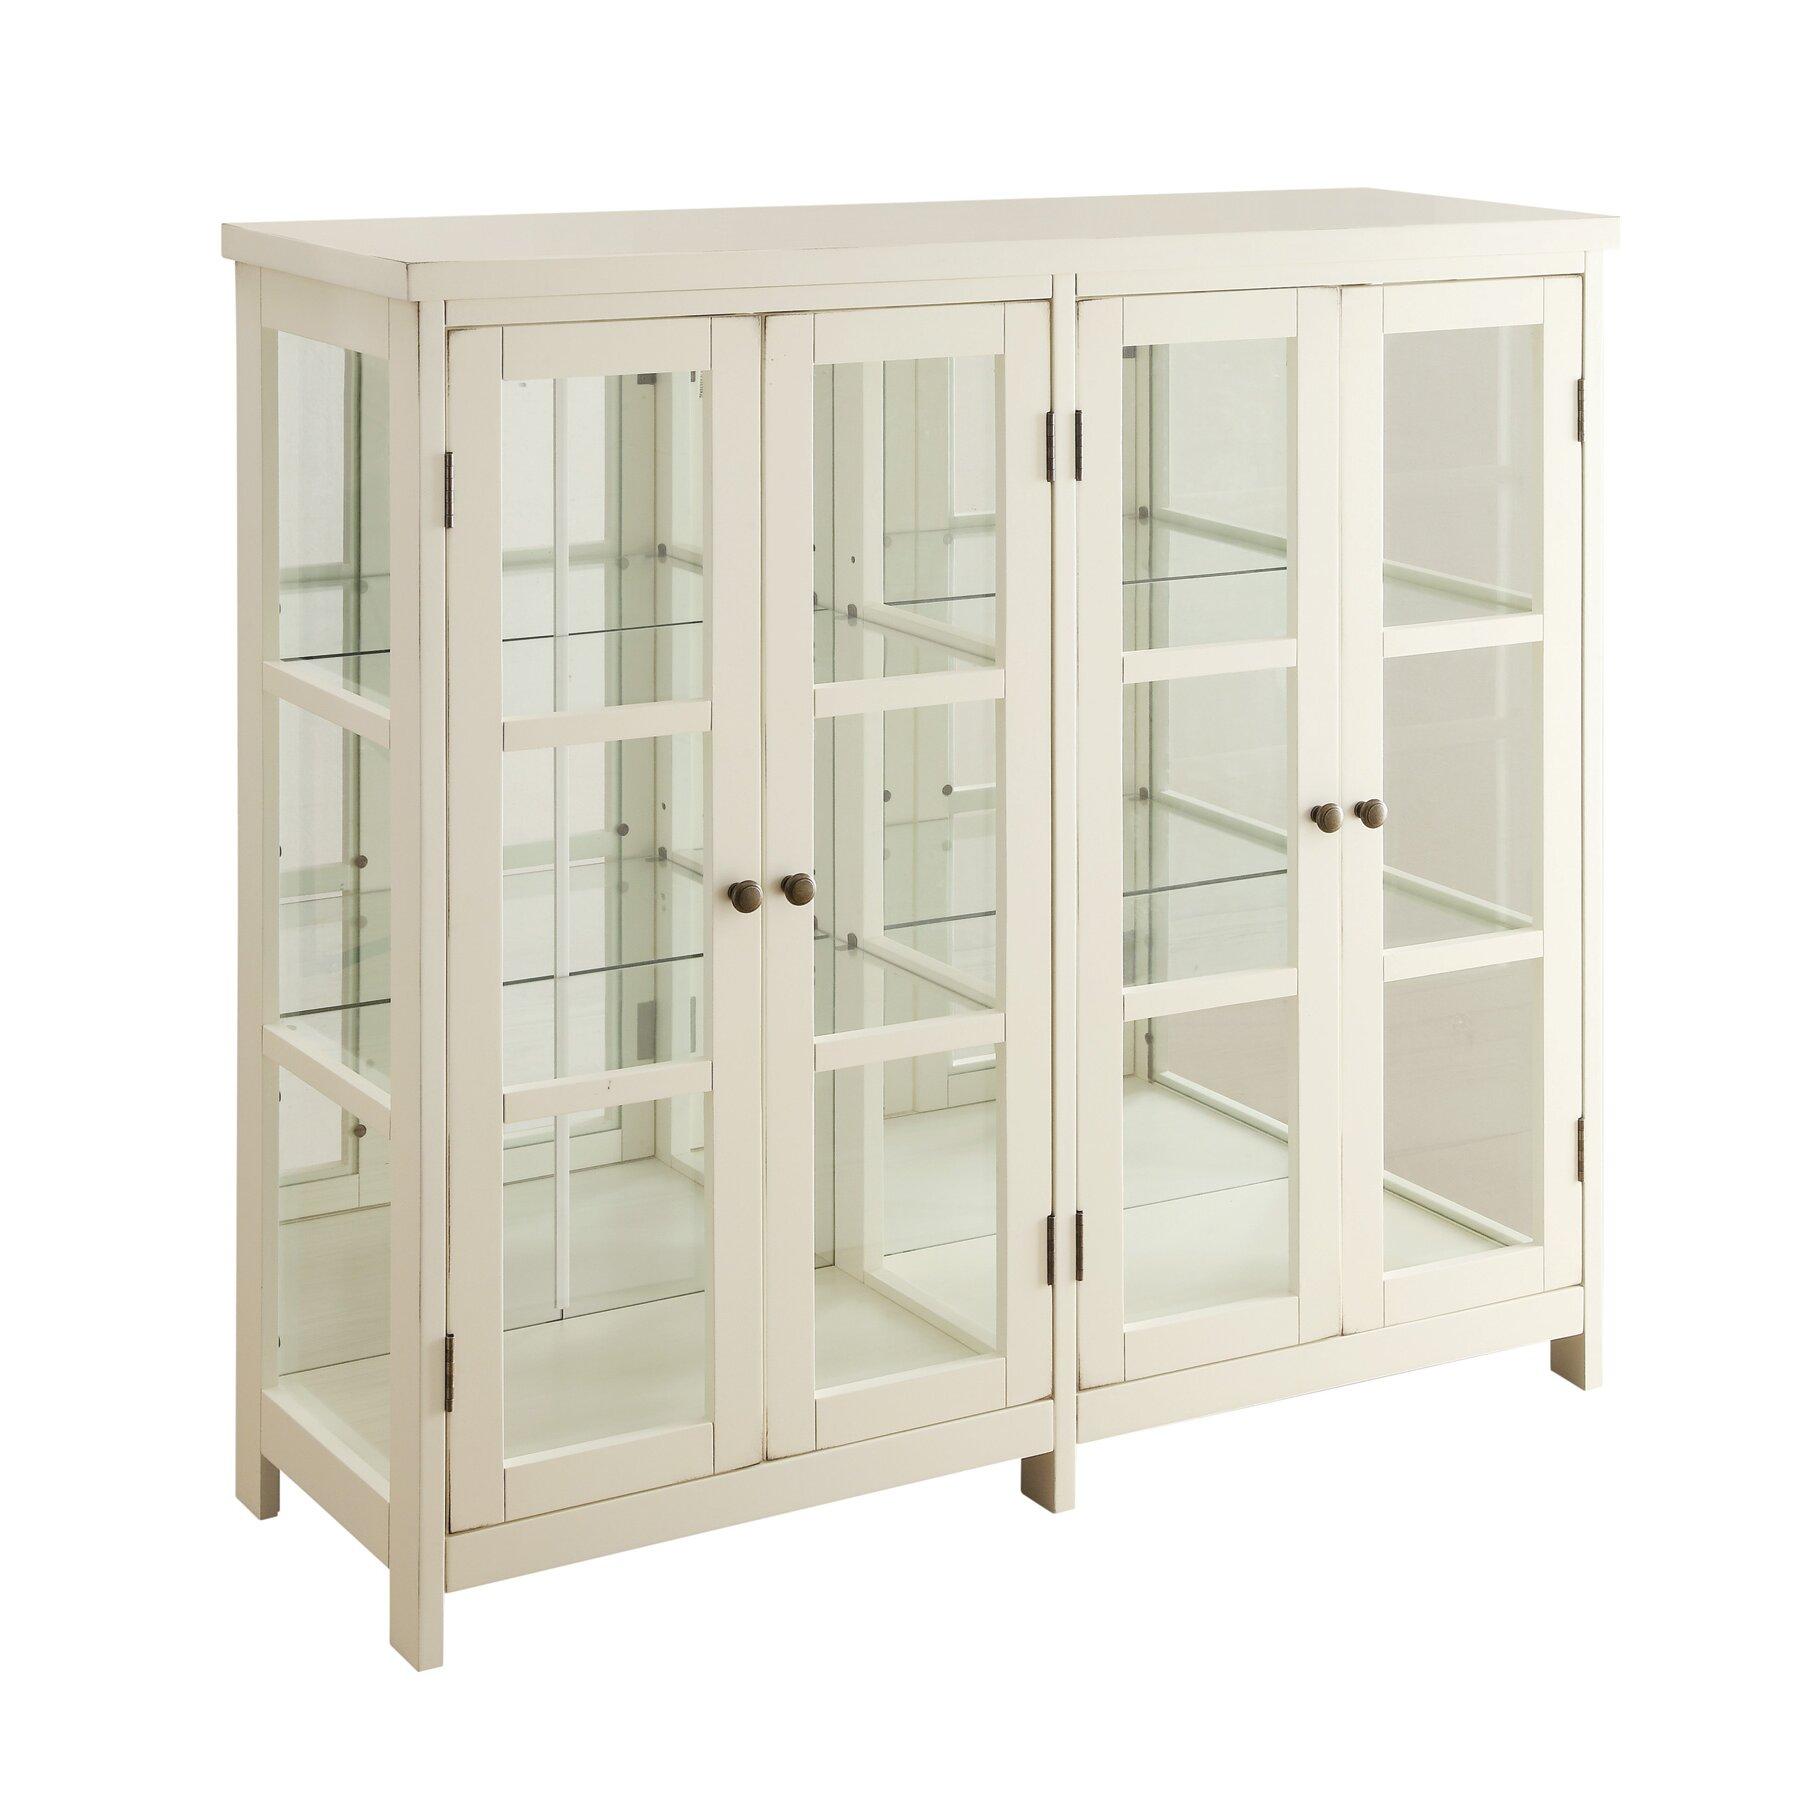 Accent cabinet with glass doors - 4 Door Accent Cabinet